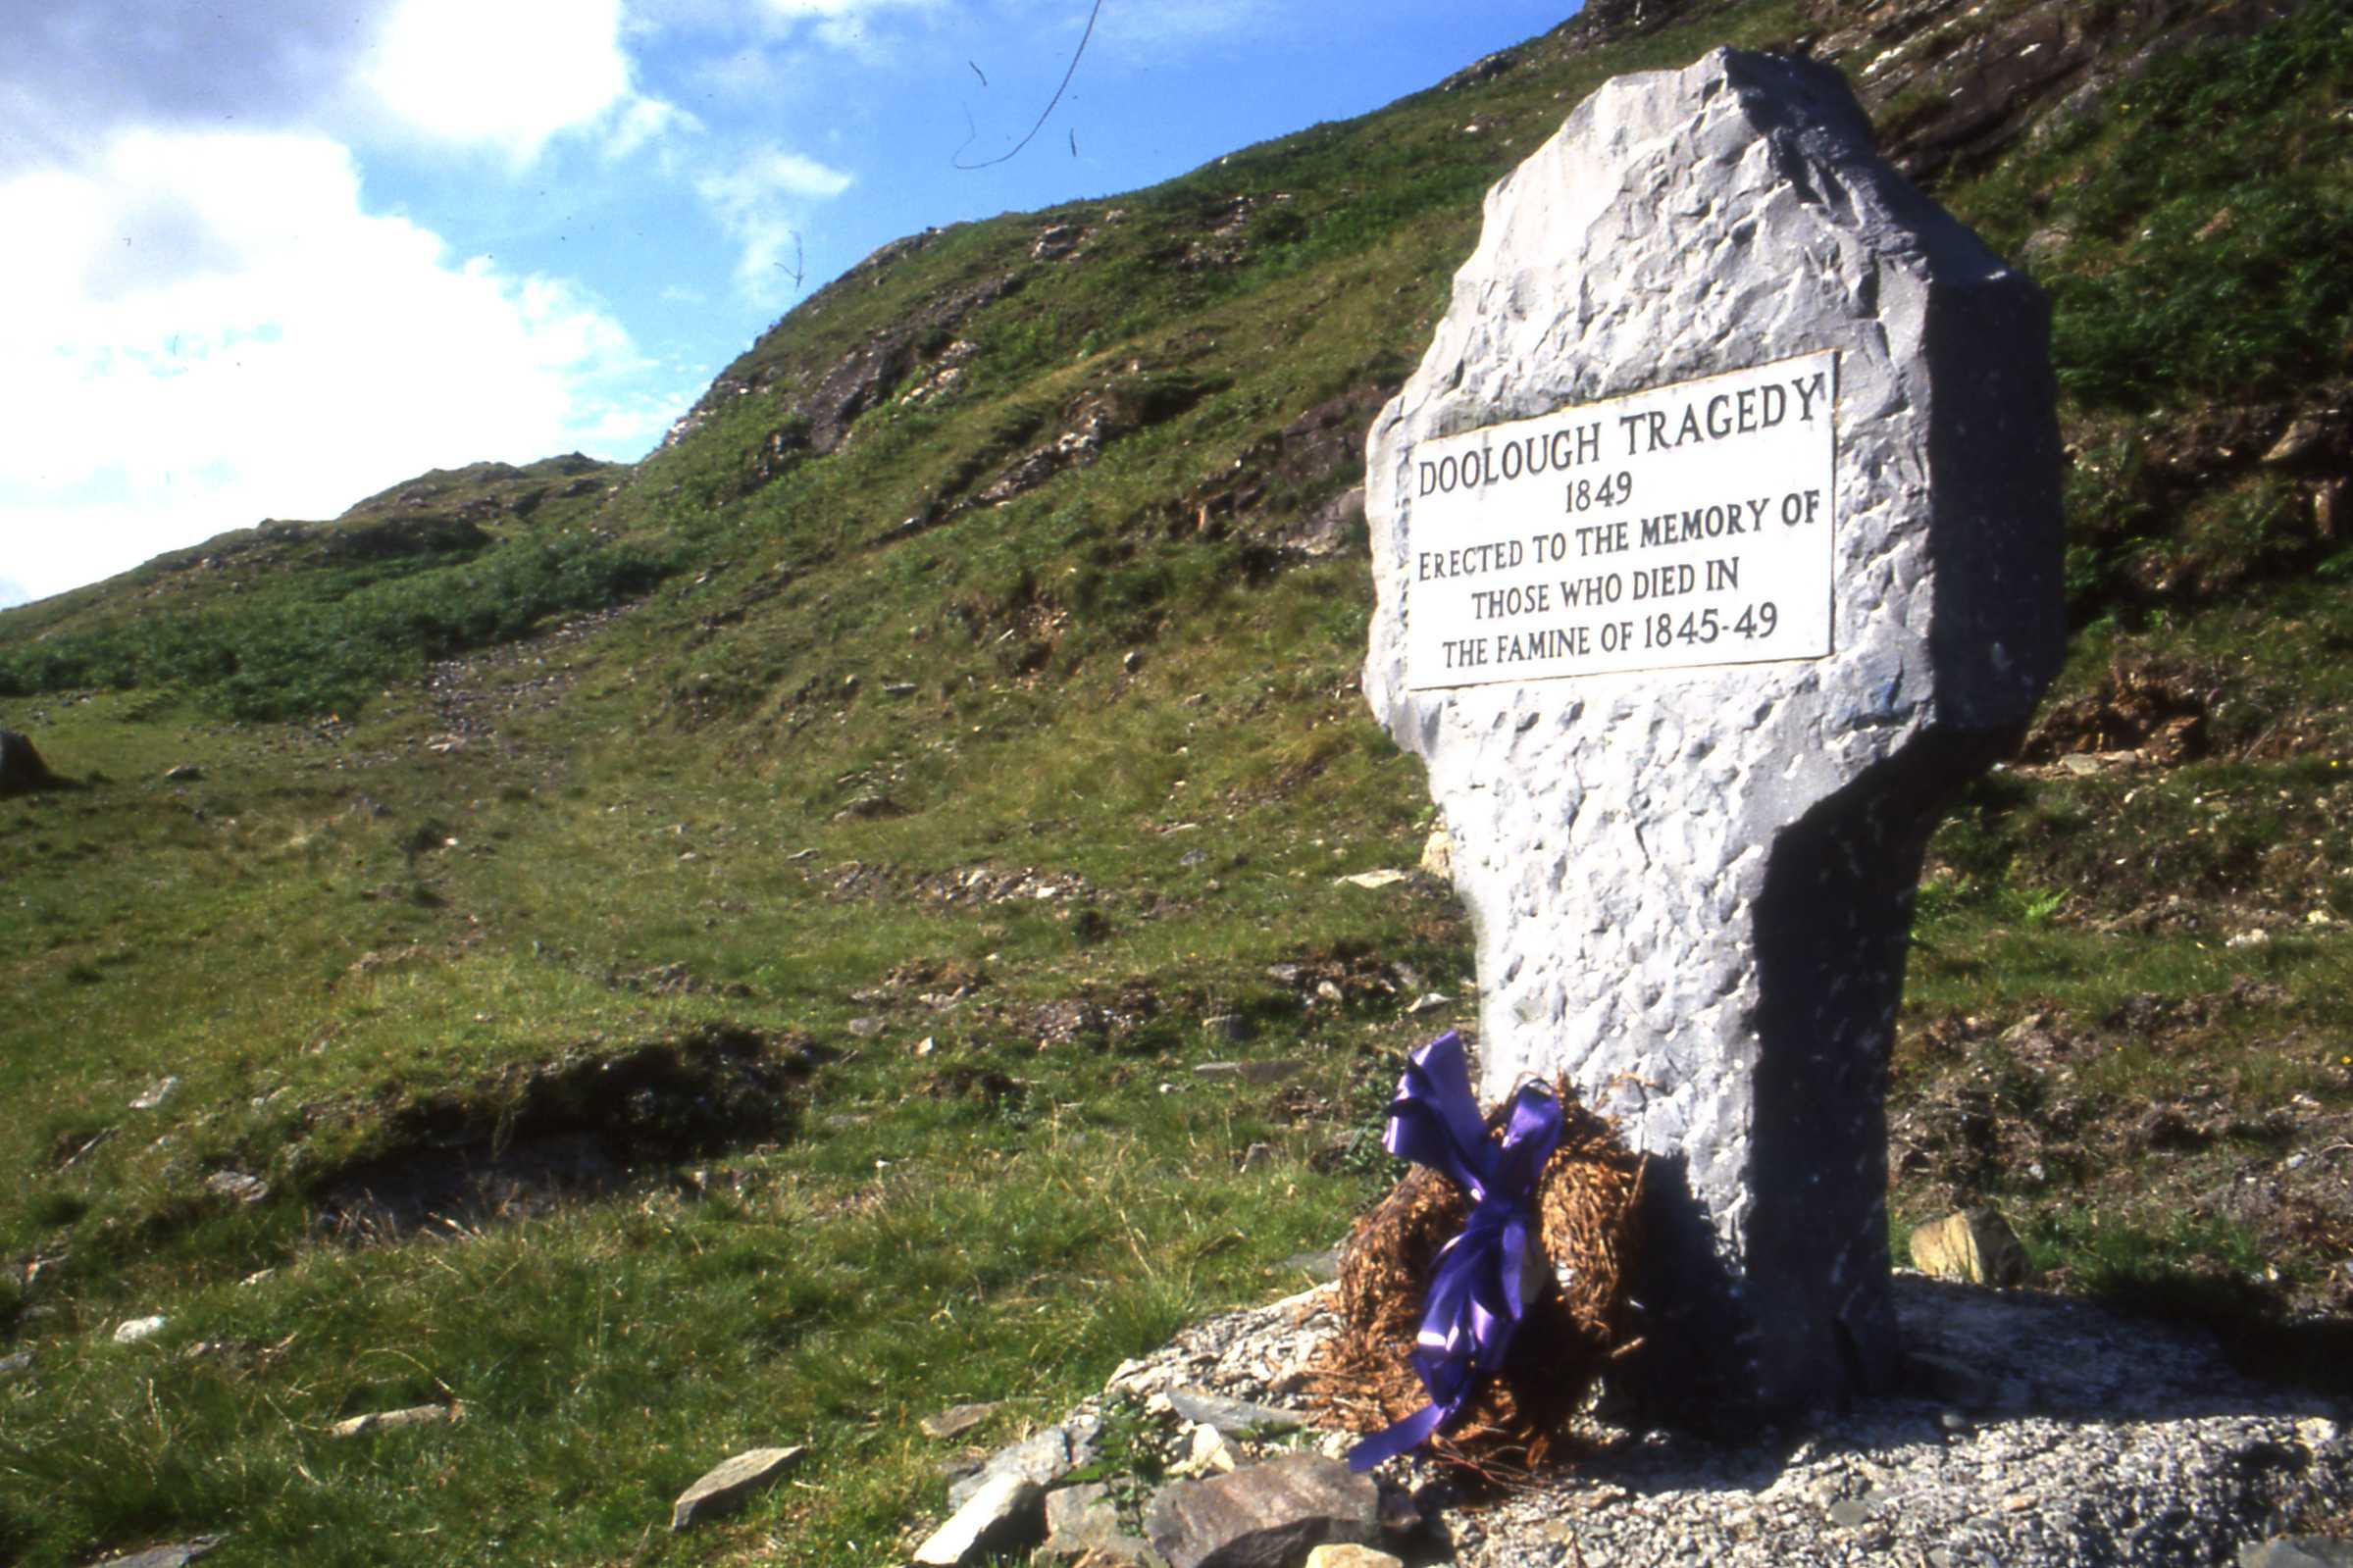 Irish potato famine memorial in Ireland